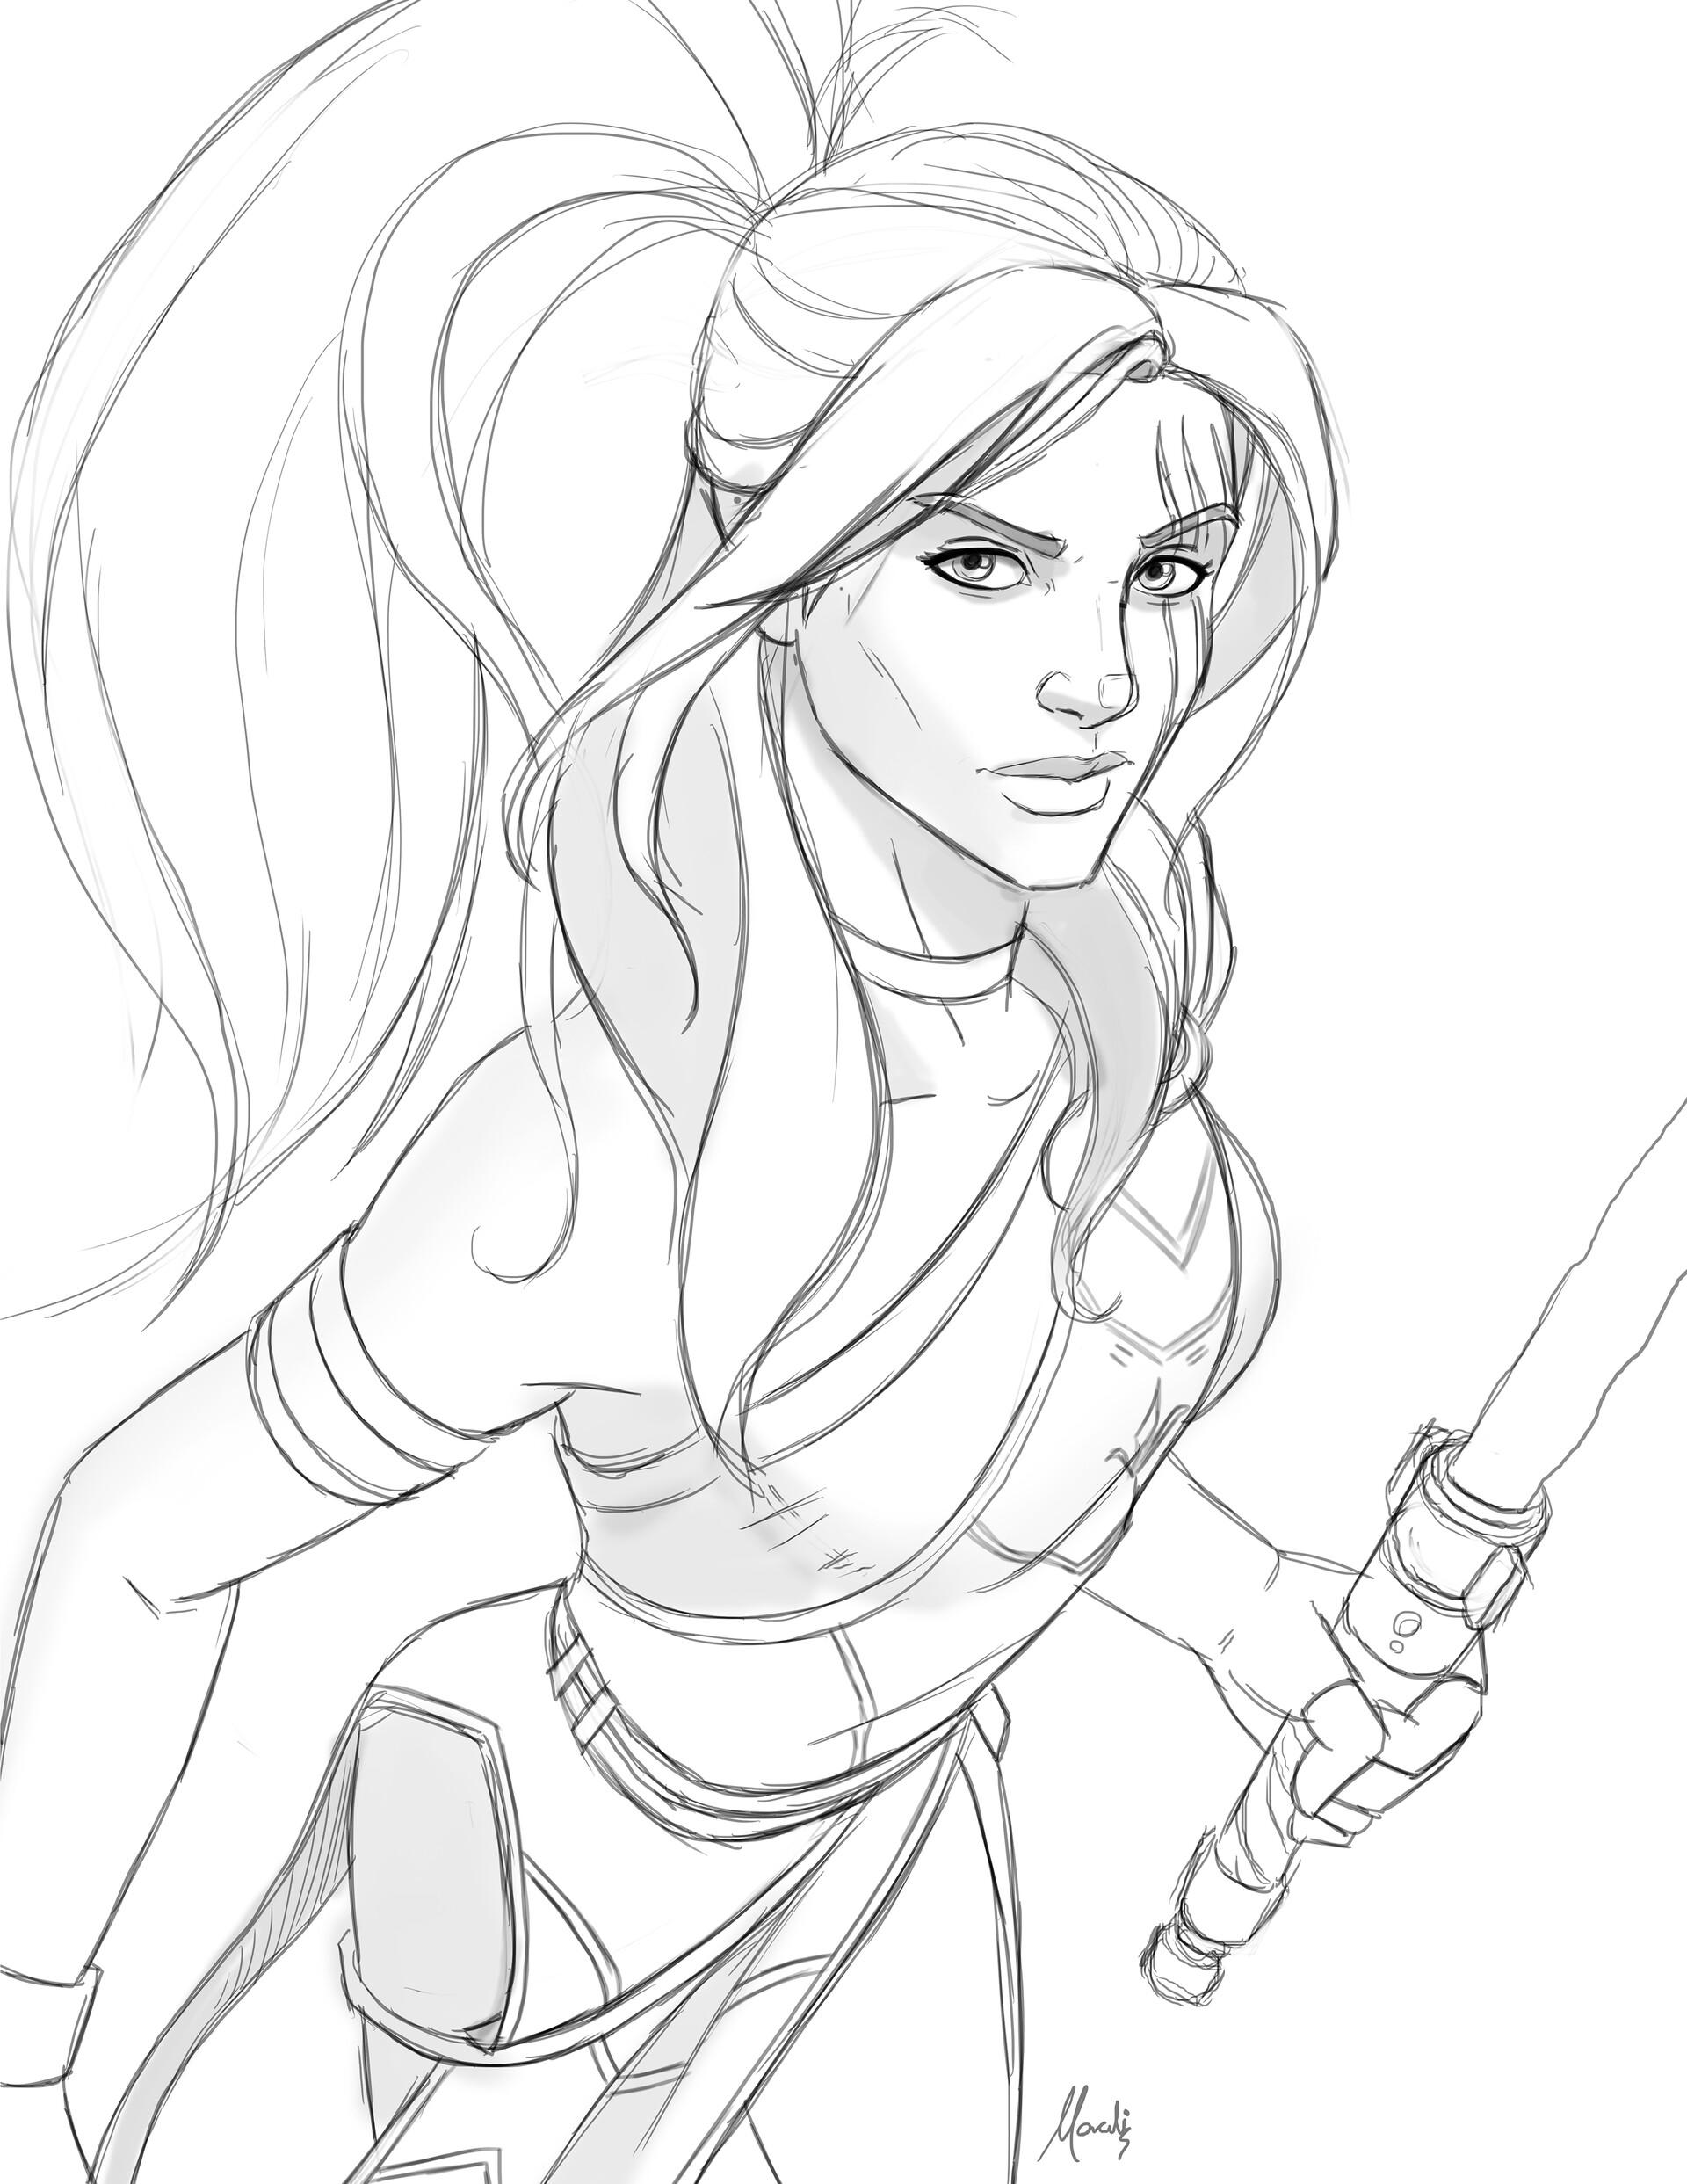 Step 2. I then sketched the details